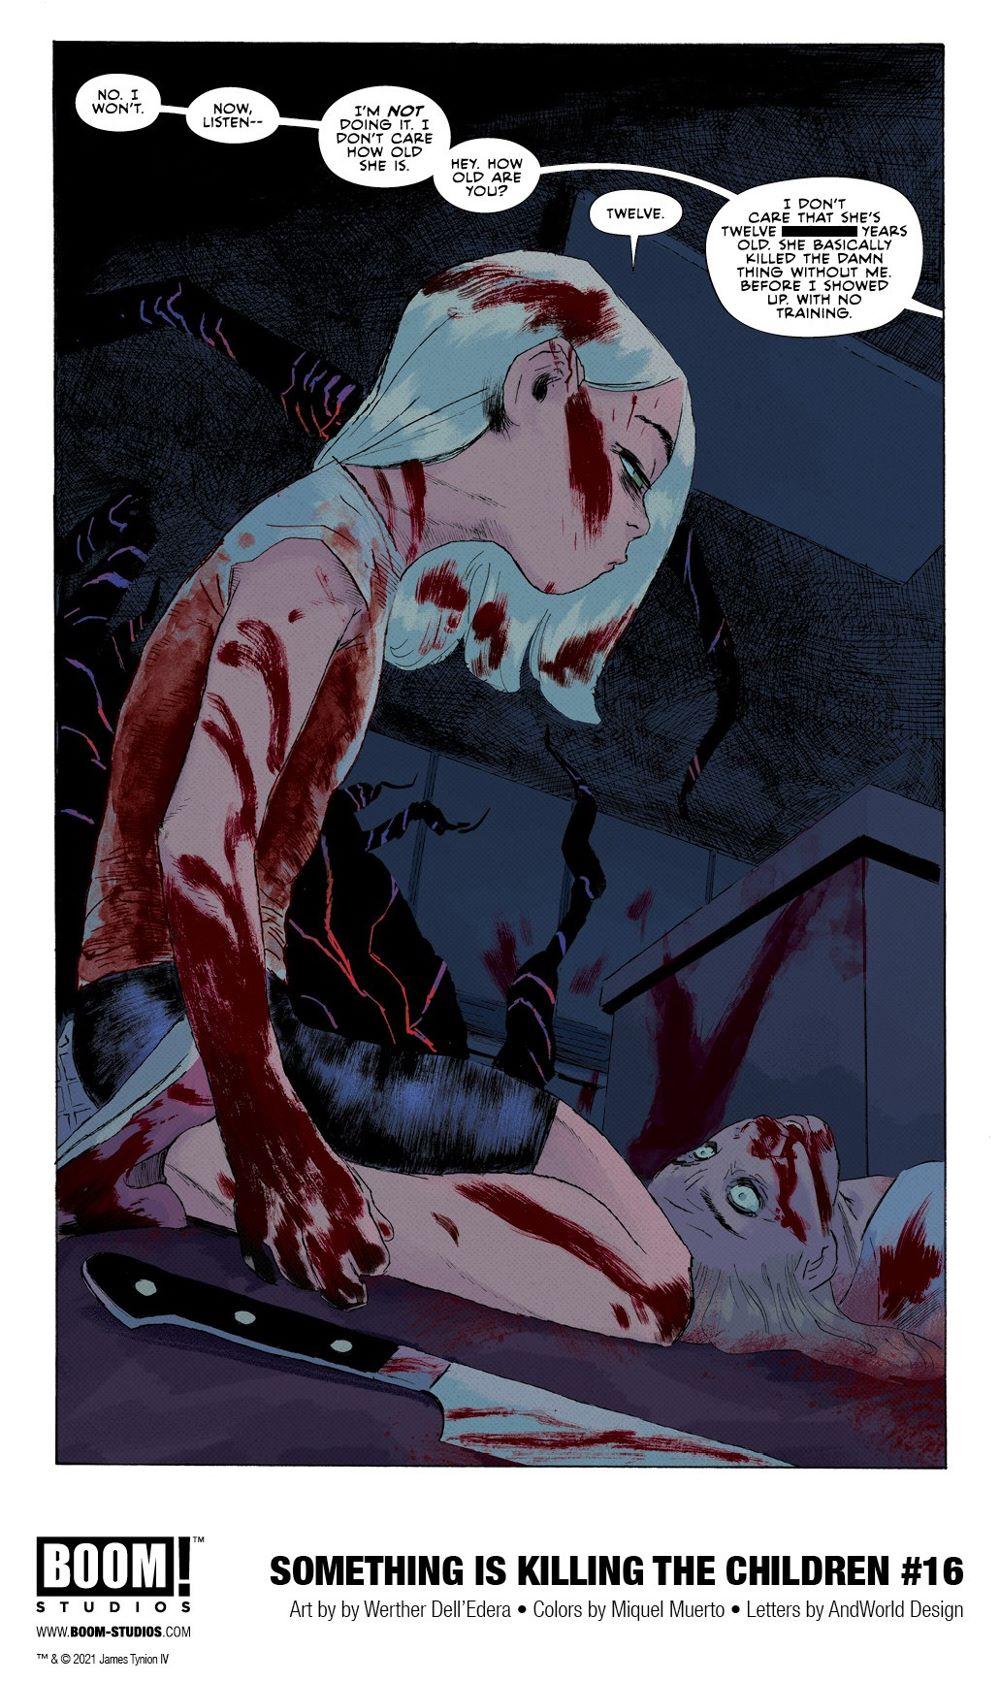 SomethingIsKillingTheChildren_016_Interiors_001_PROMO First Look at BOOM! Studios' SOMETHING IS KILLING THE CHILDREN #16